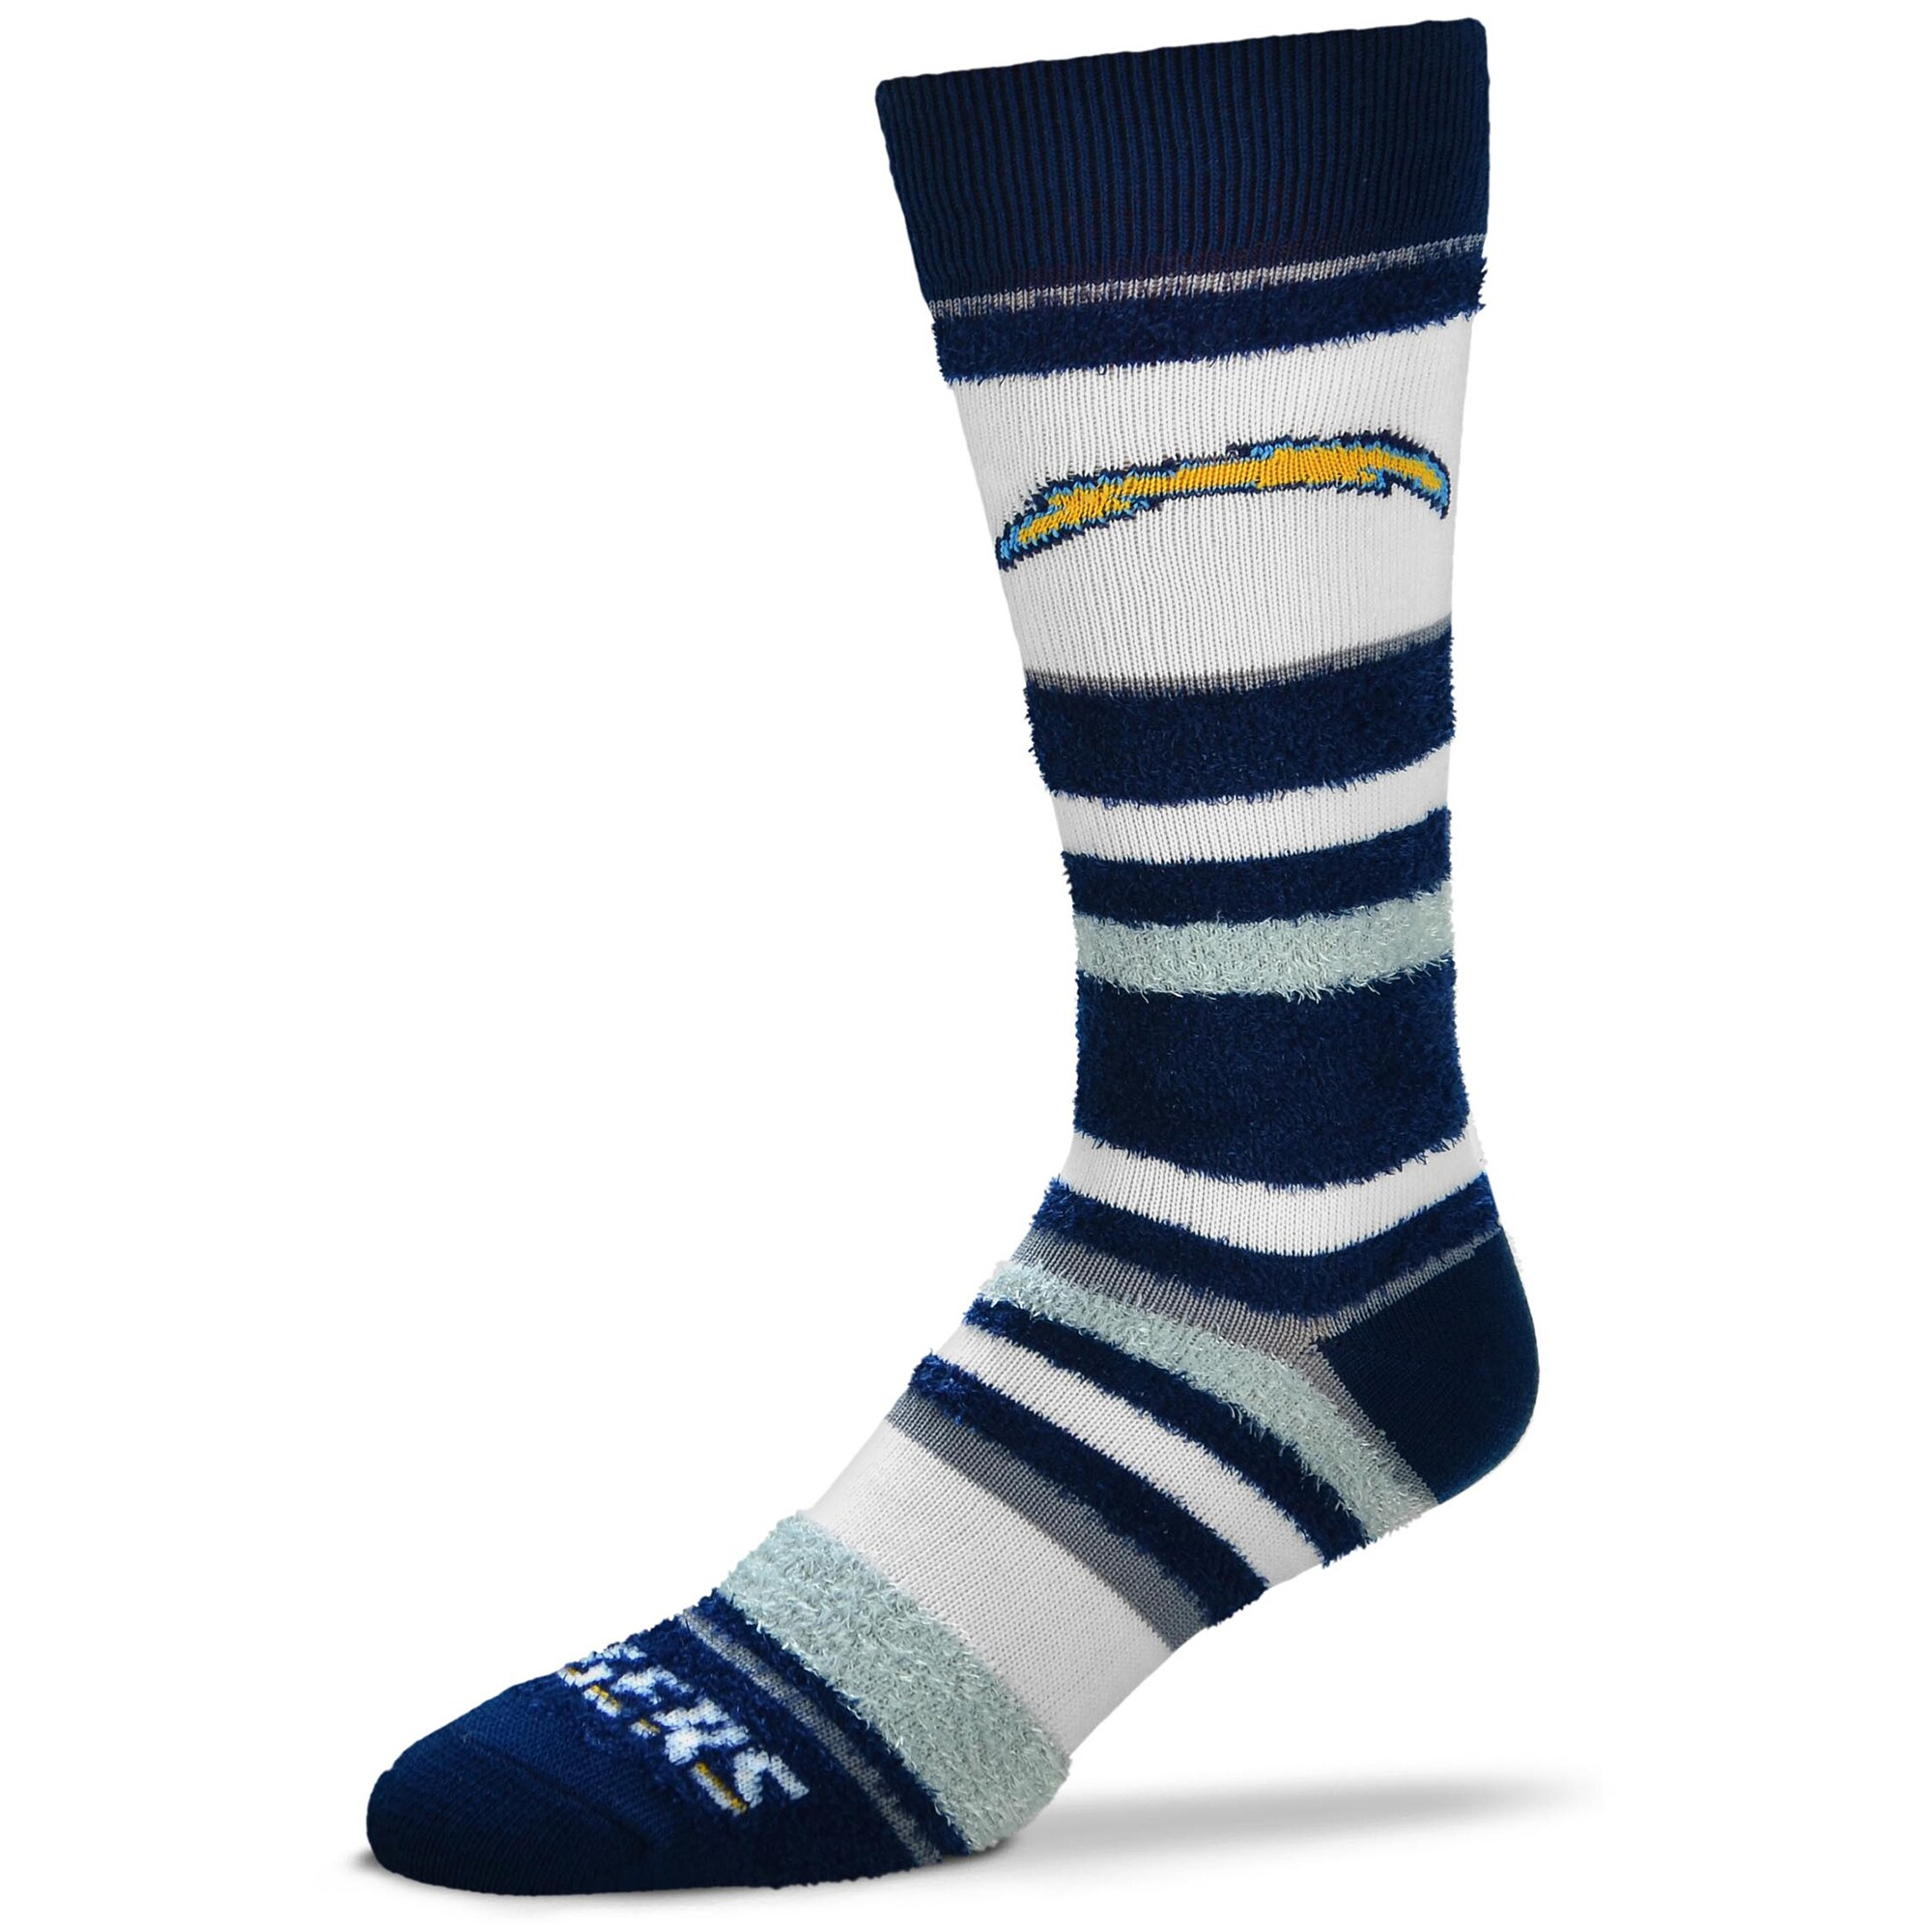 Los Angeles Chargers For Bare Feet Women's Soft Stripe Quarter-Length Socks